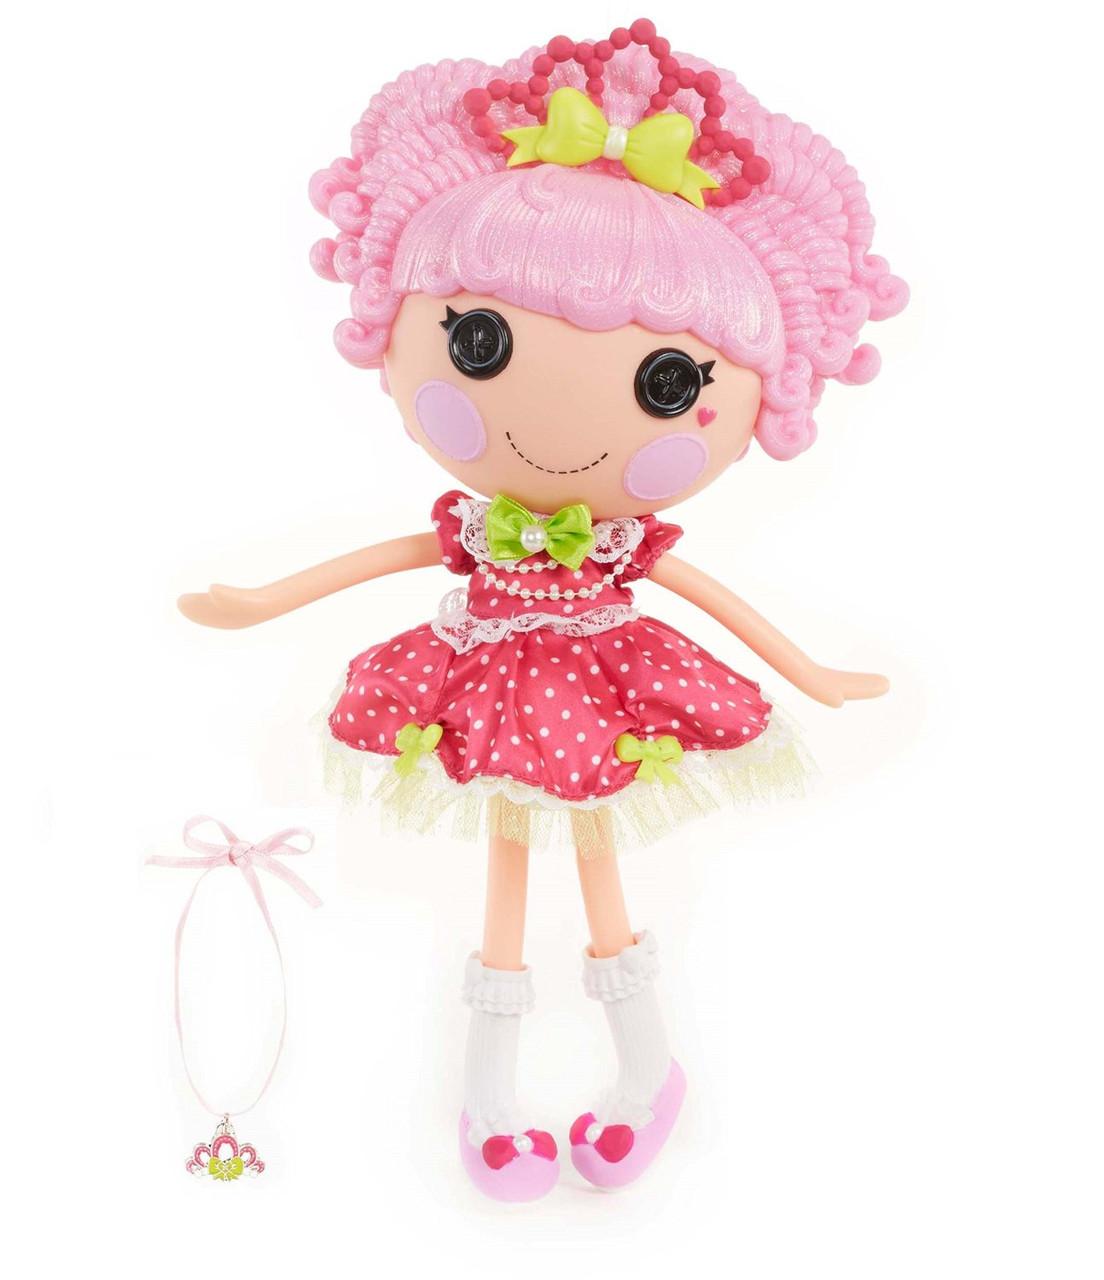 Lalaloopsy Кукла Лалалупси Принцесса Блестинка c аксессуарами